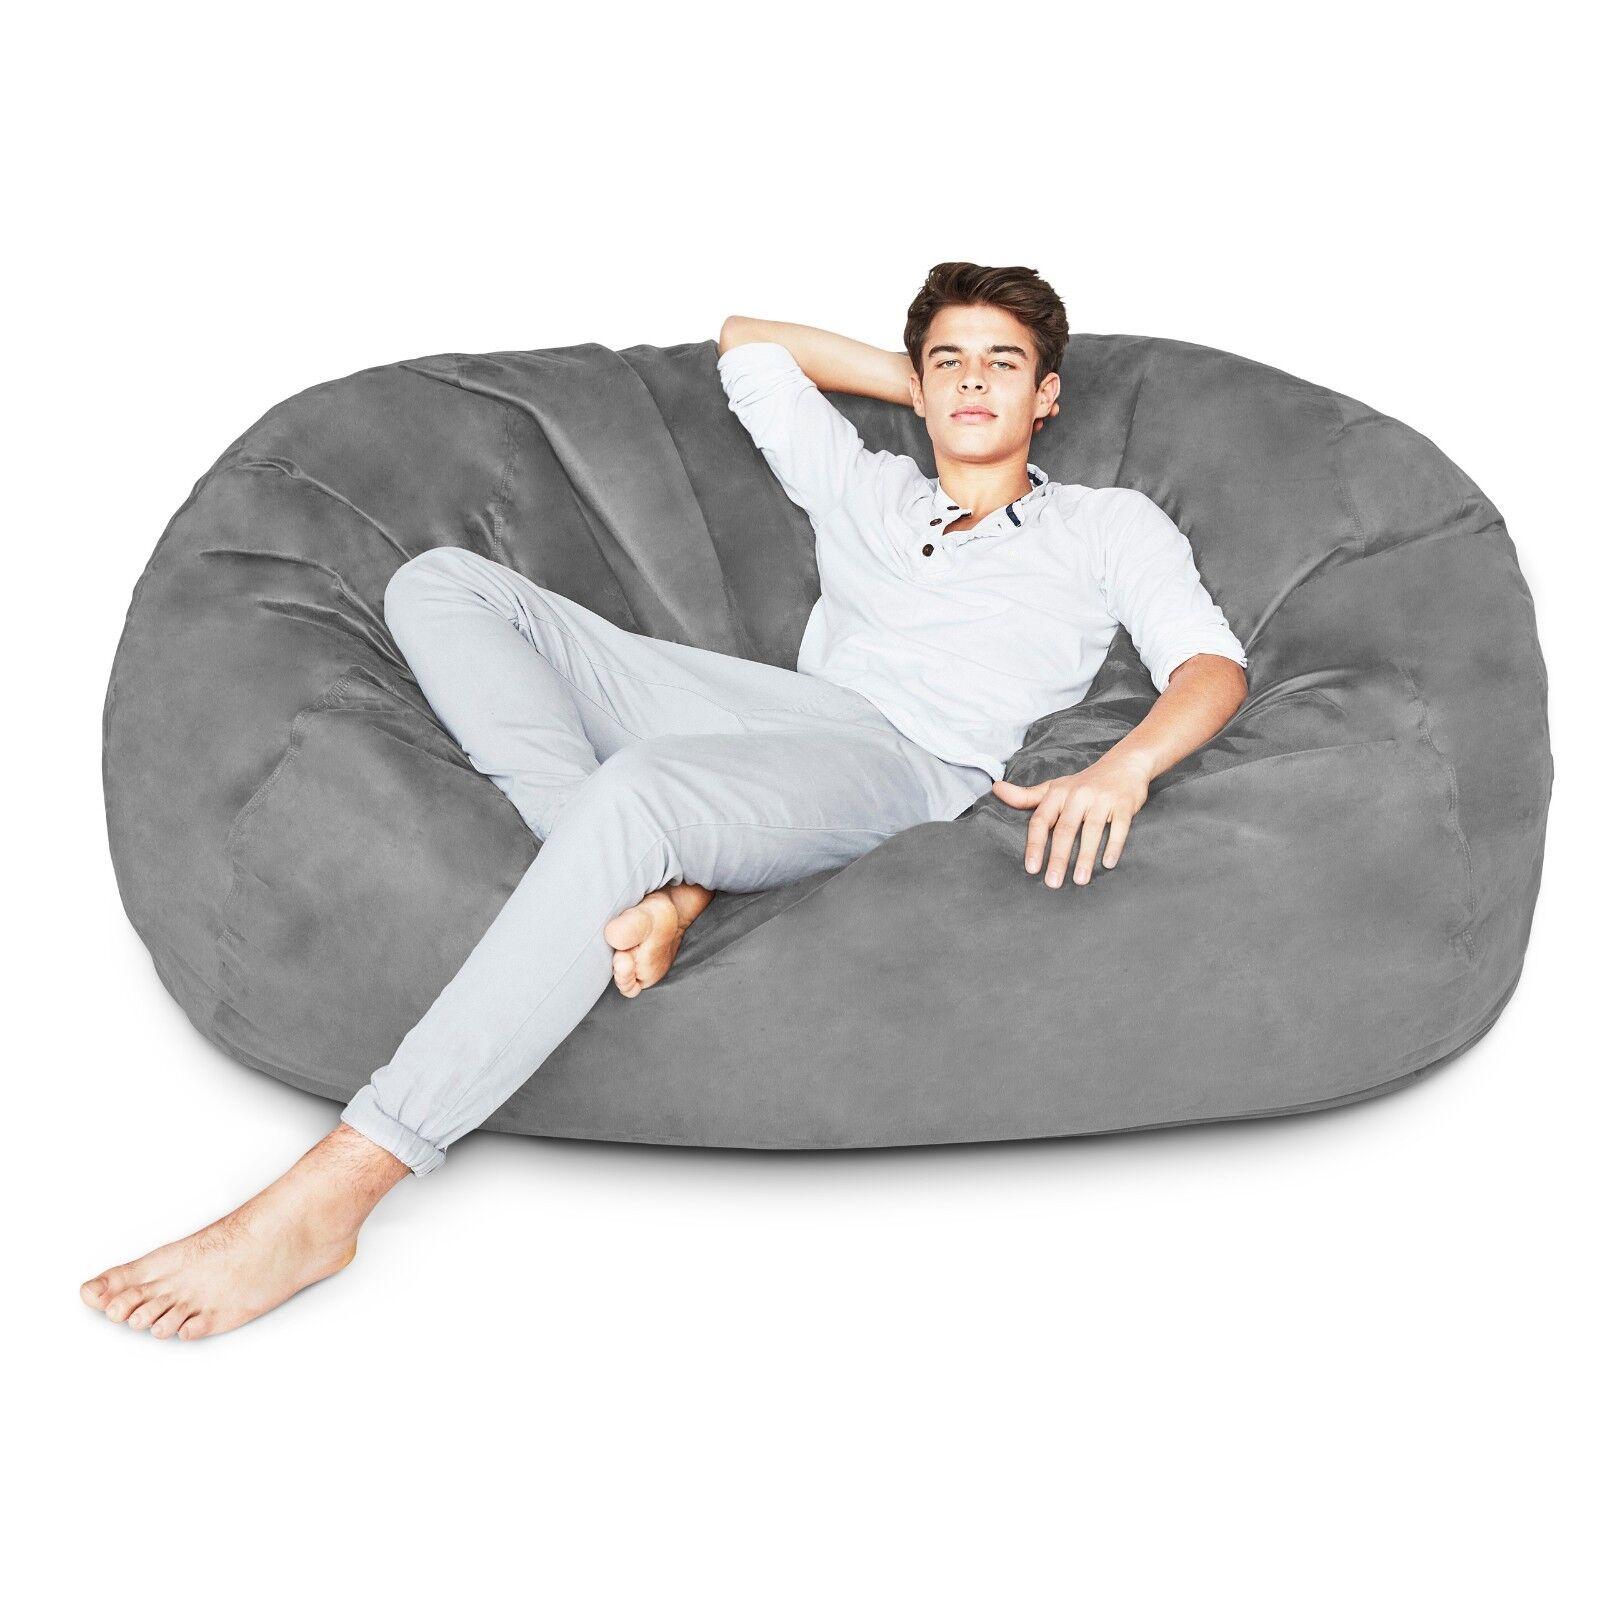 Large Adult Bean Bag Chair 6ft Foam filled Oversize Sleeper